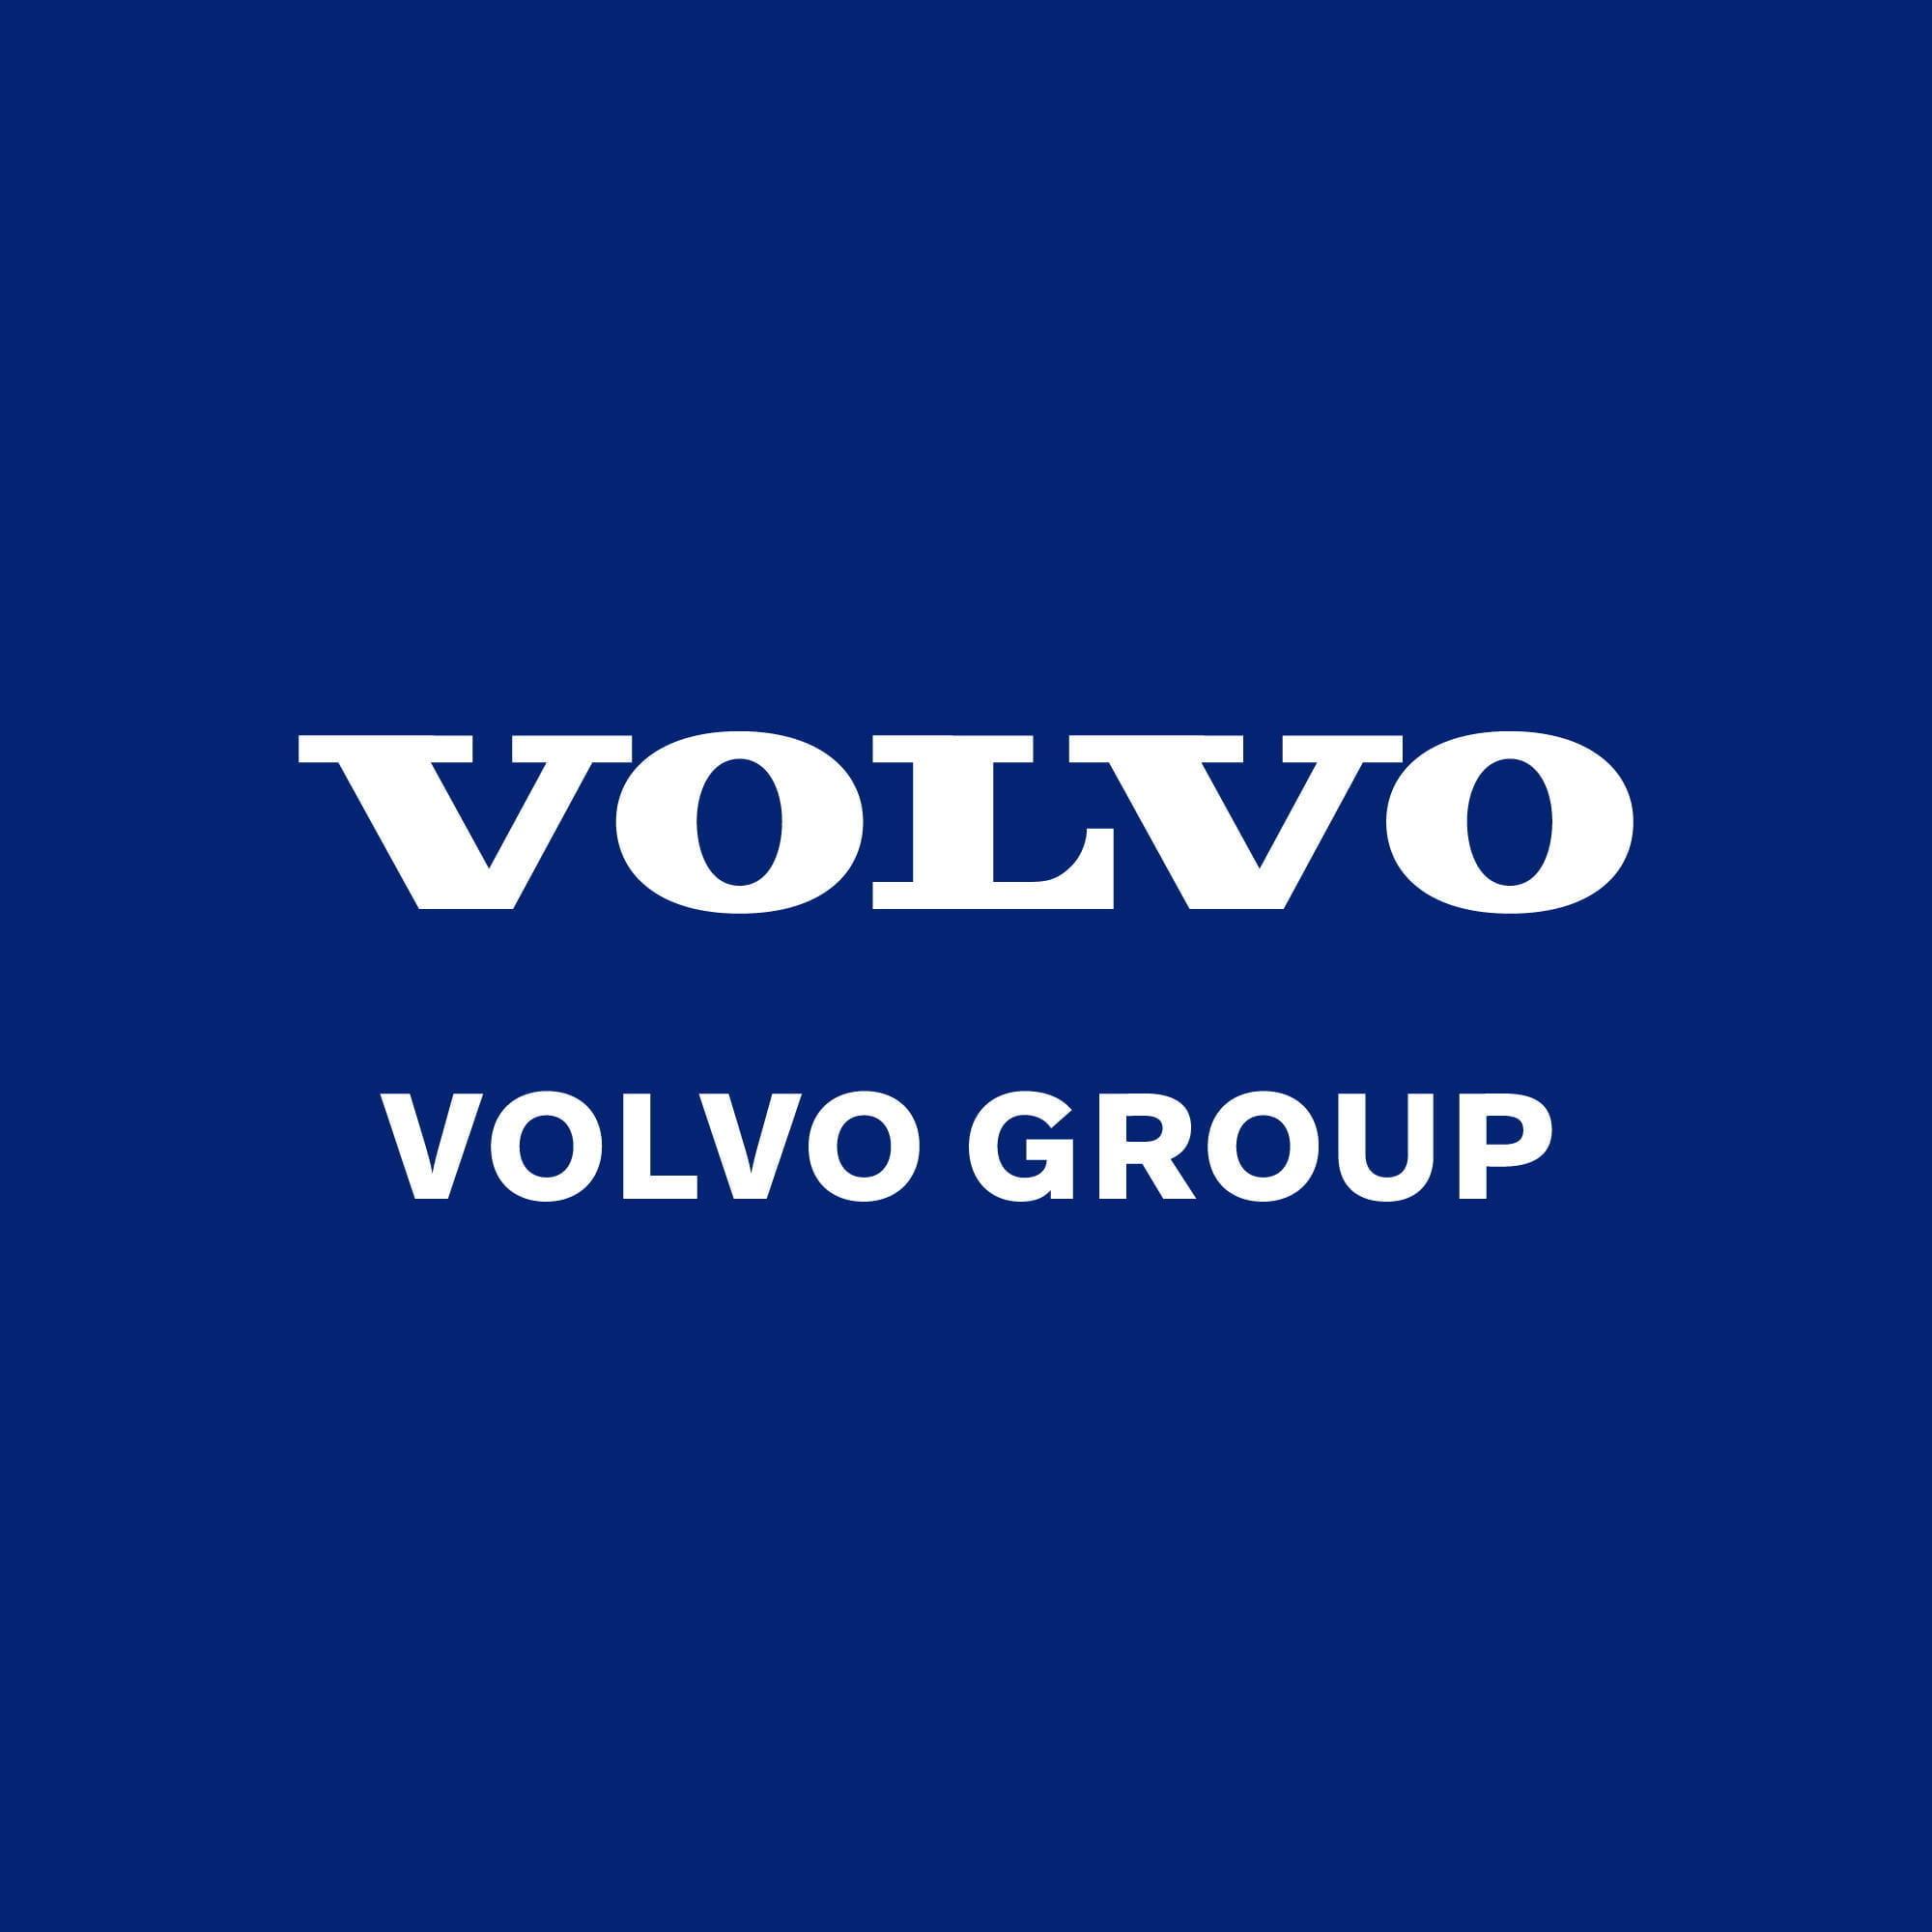 B. Volvo Group